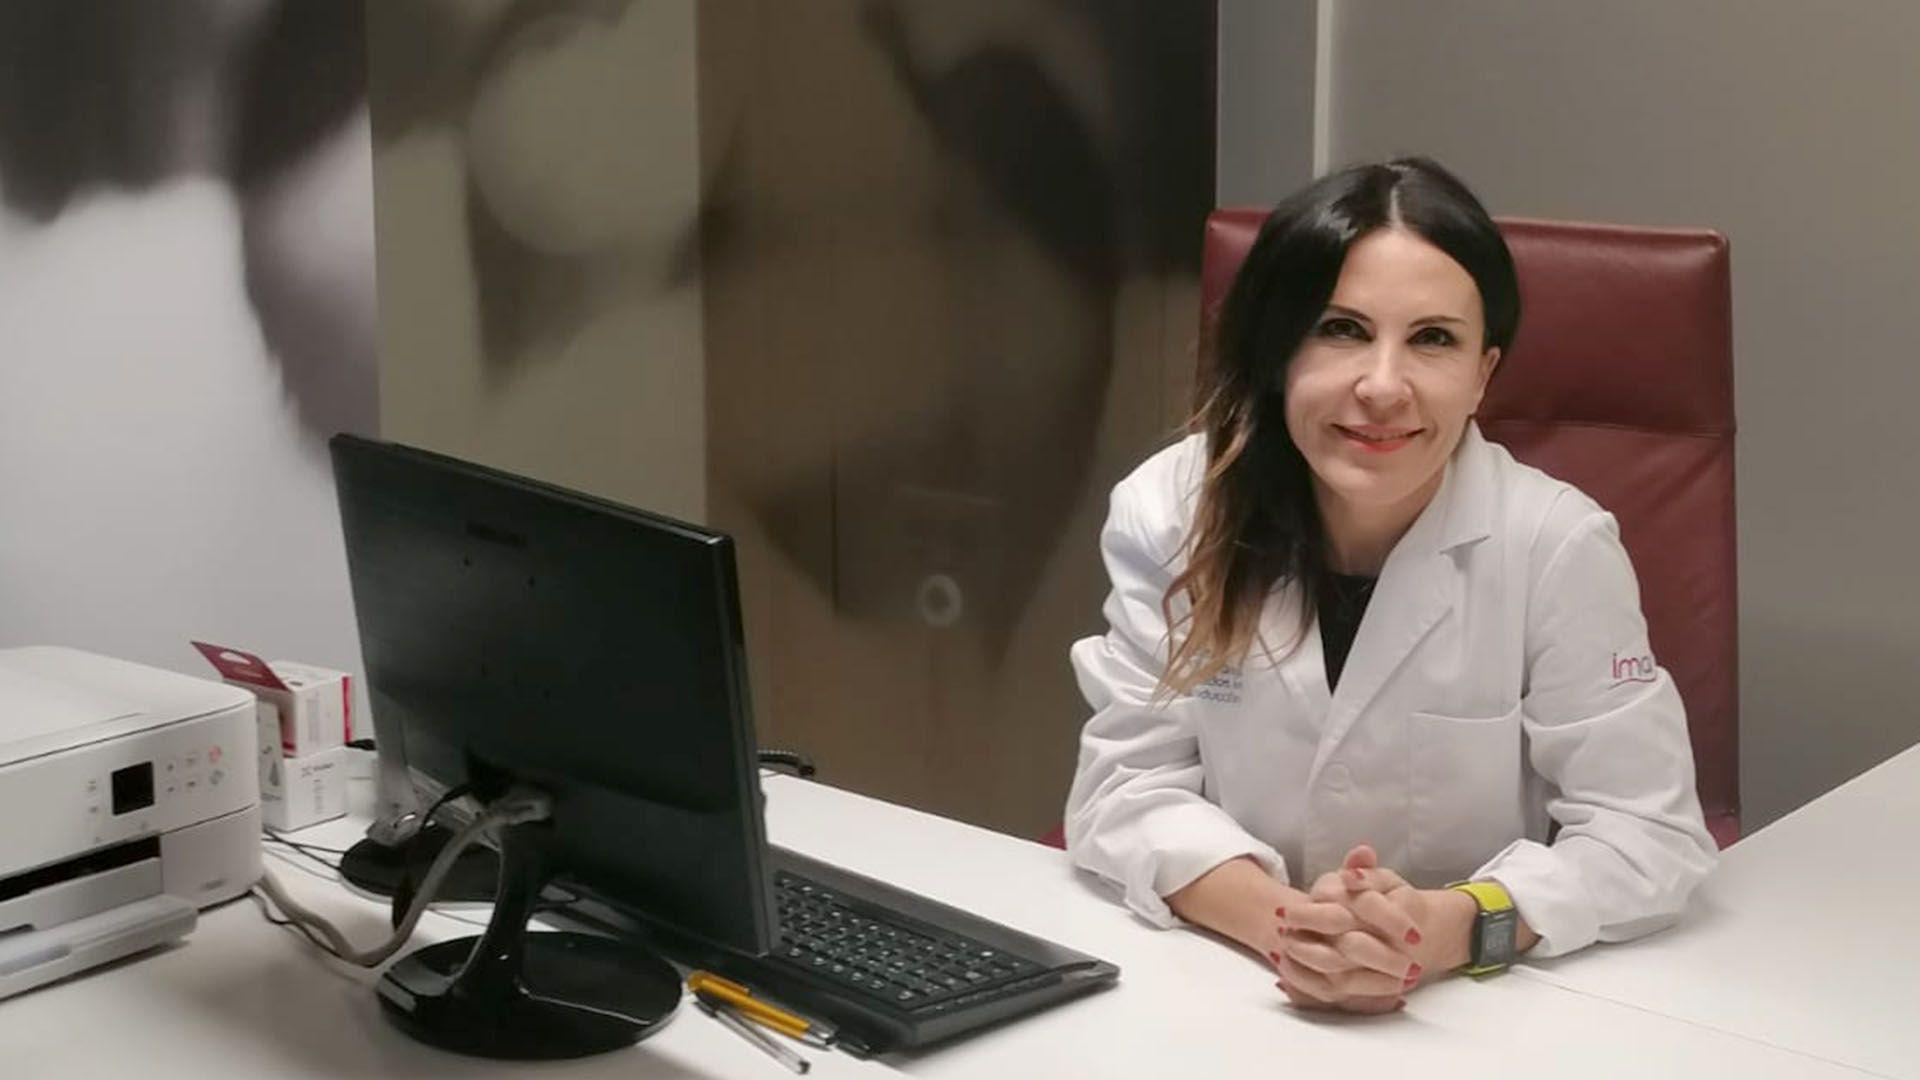 Dra. Sofía Sánchez Pérez